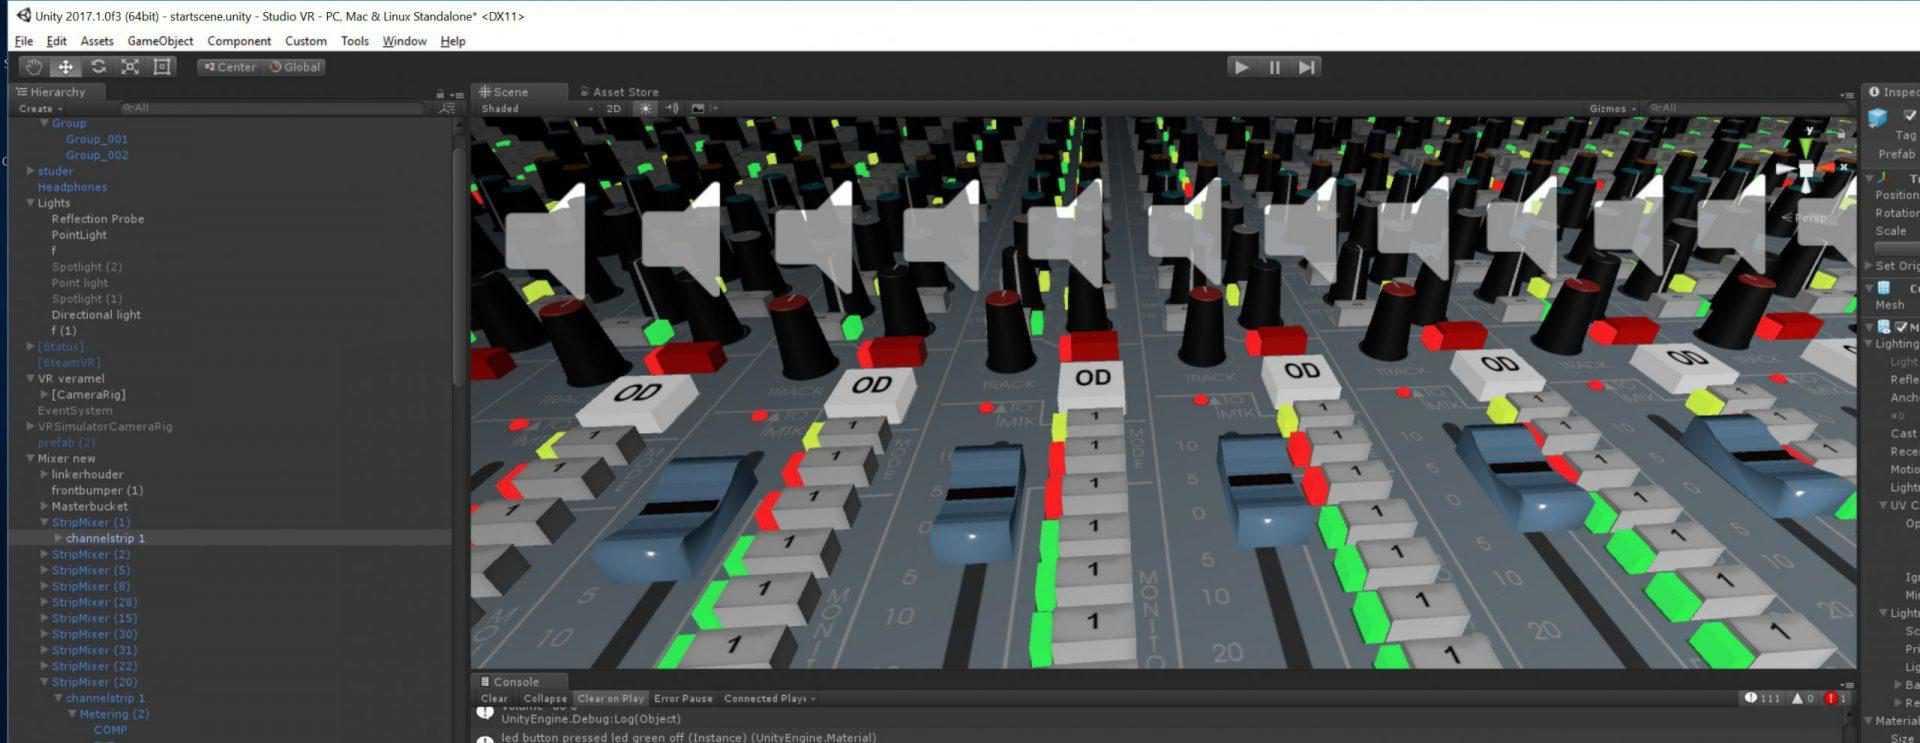 Building the VR Studio 2 sound sources per channel